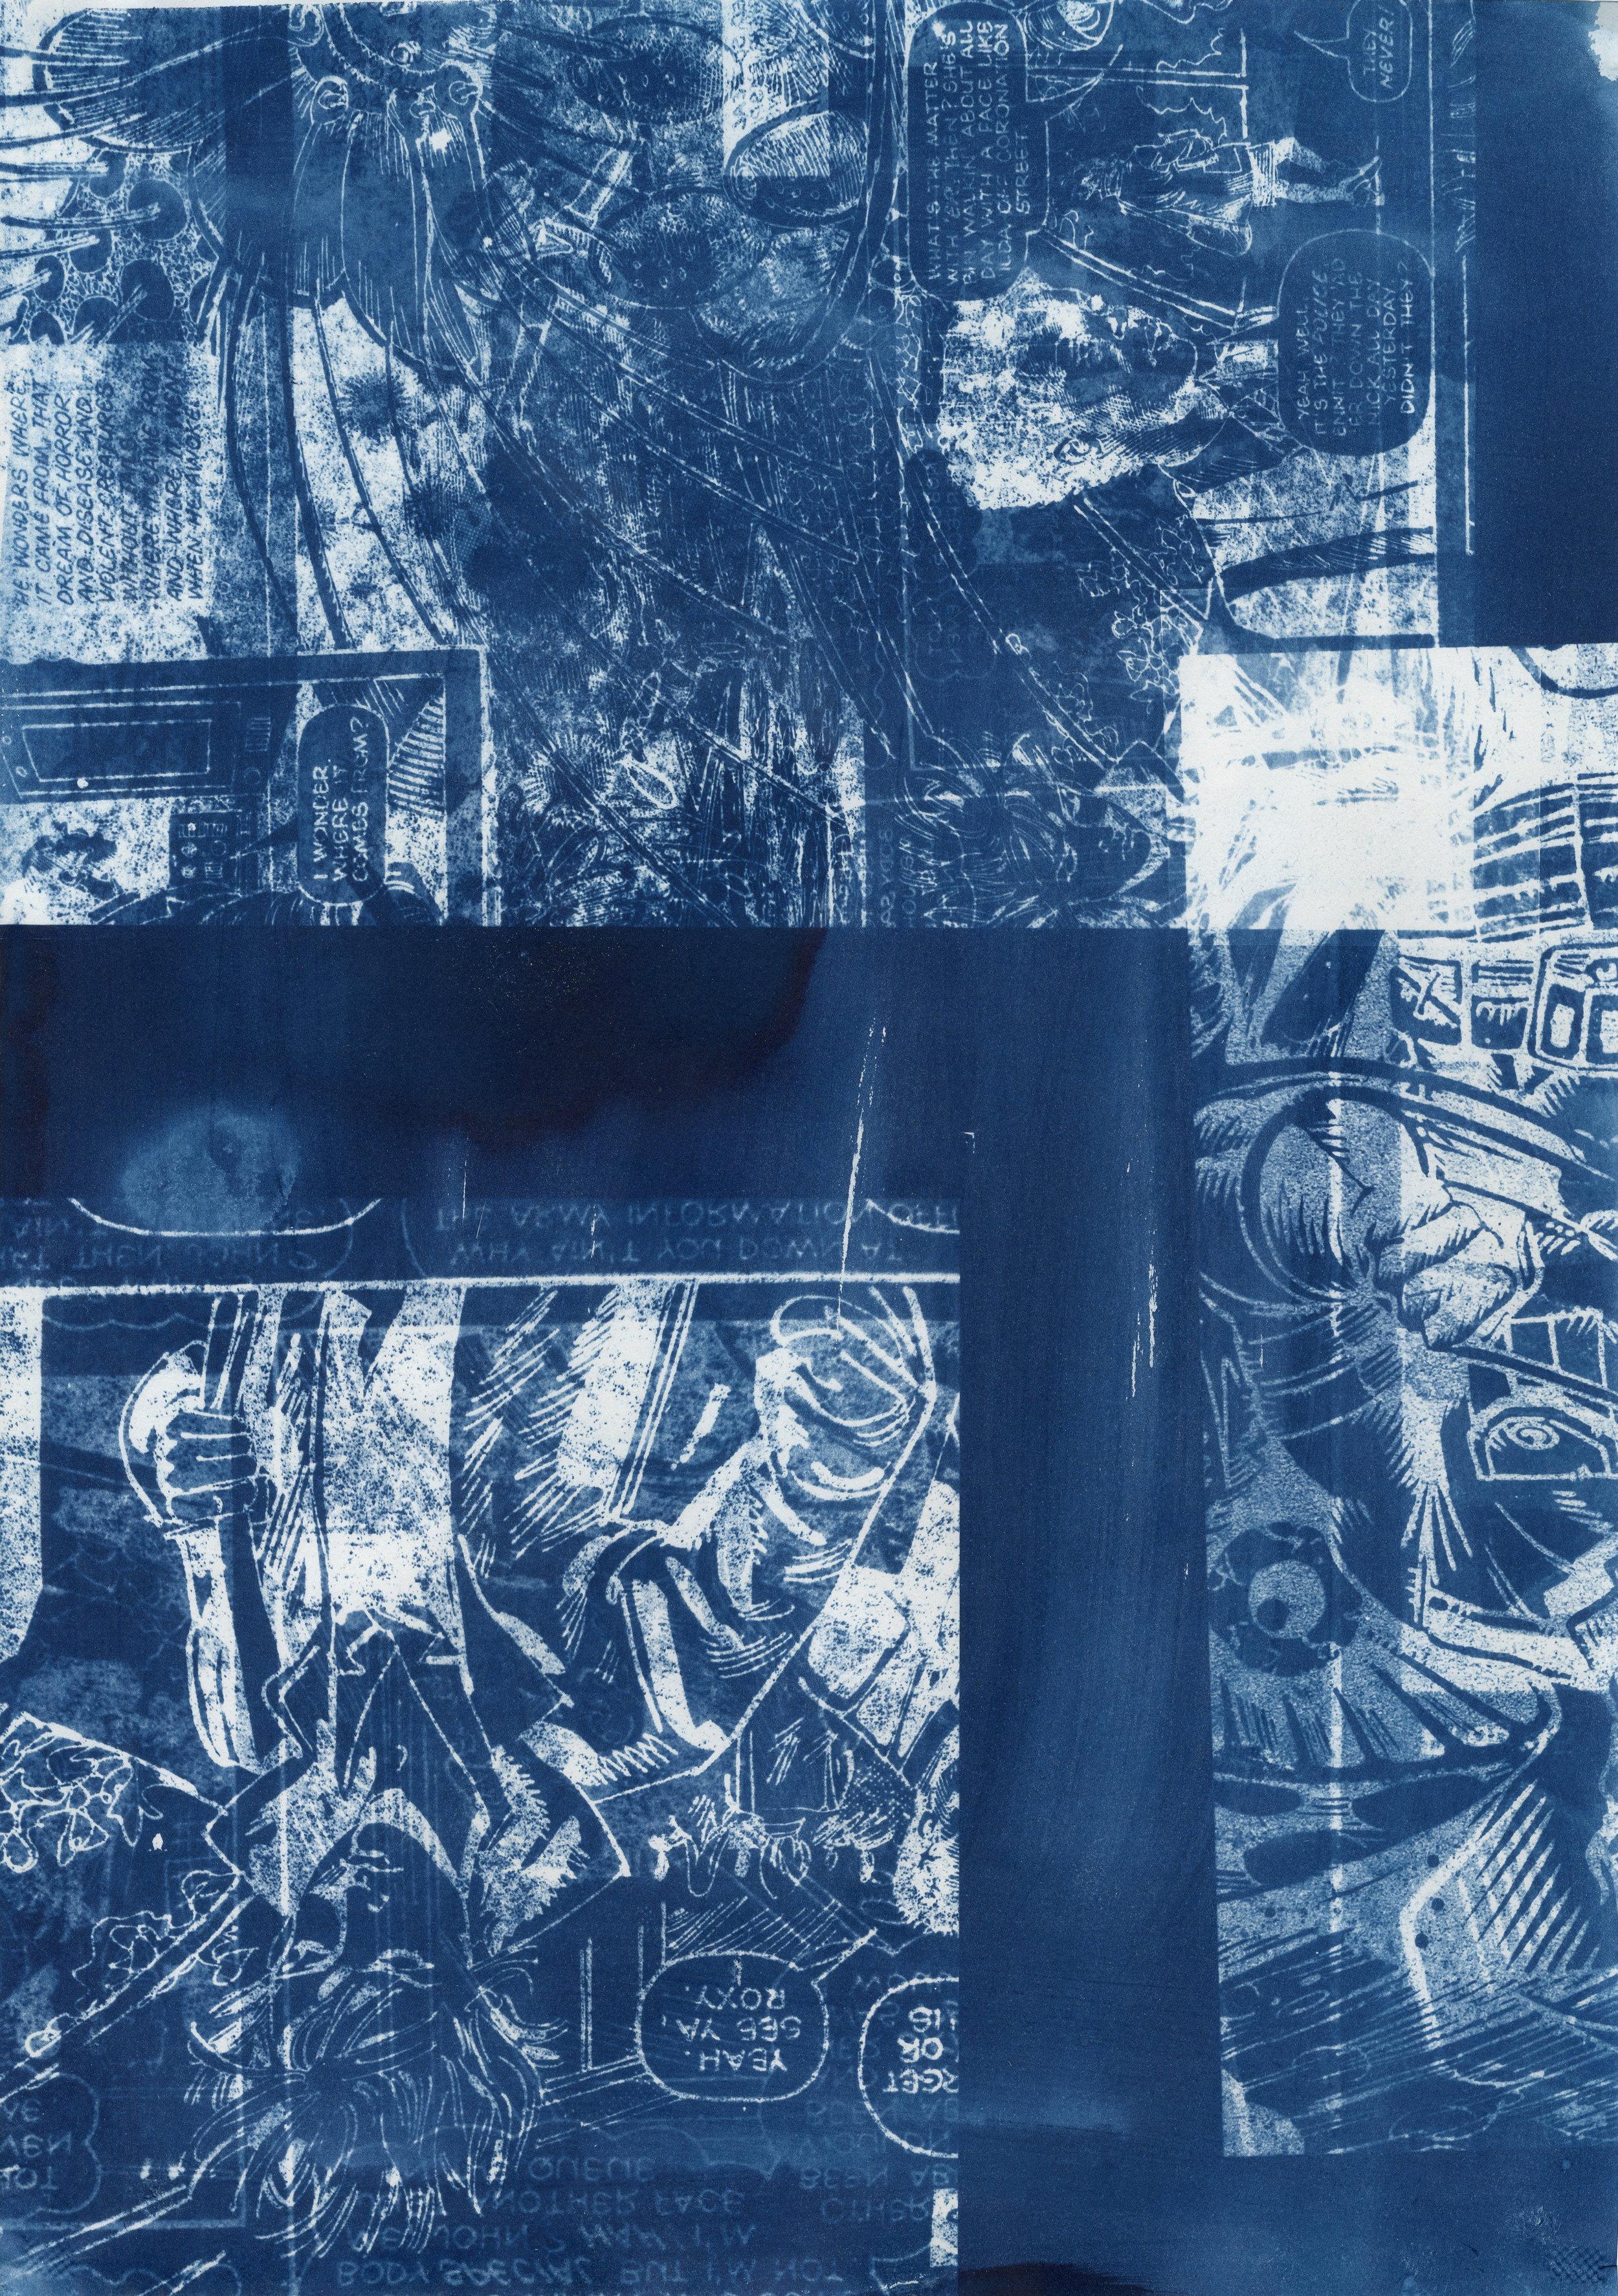 cyanotype 1008 copy.jpg